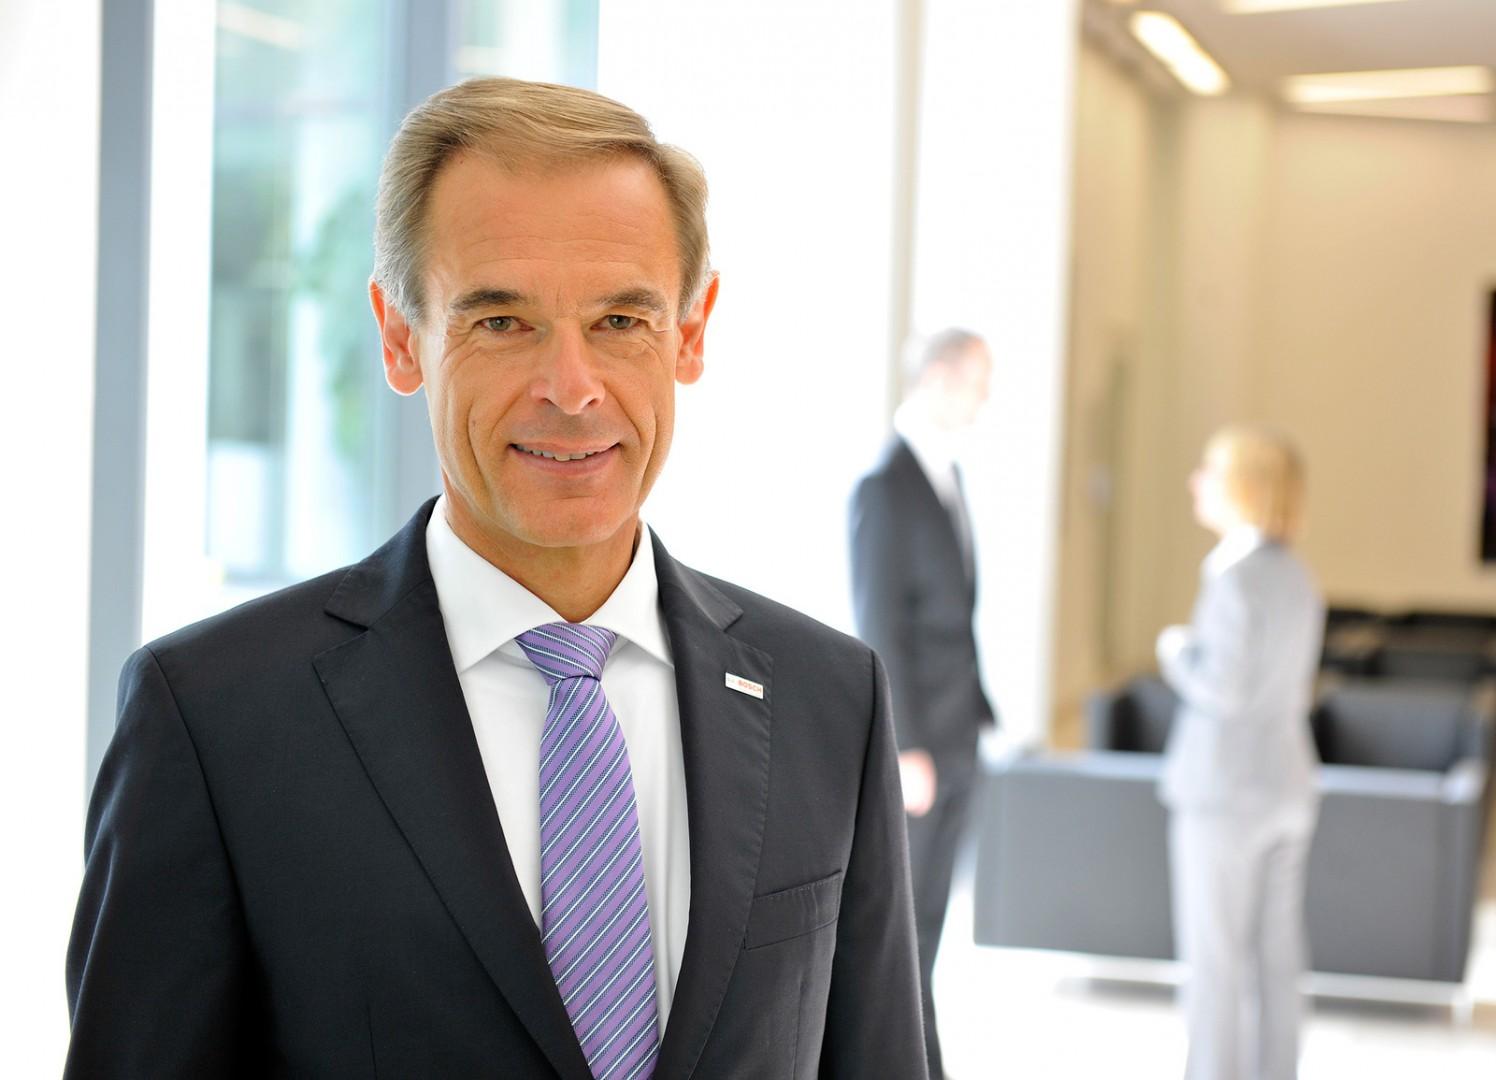 dr Volkmar Denner, prezes zarządu spółki Robert Bosch. Fot. Bosch